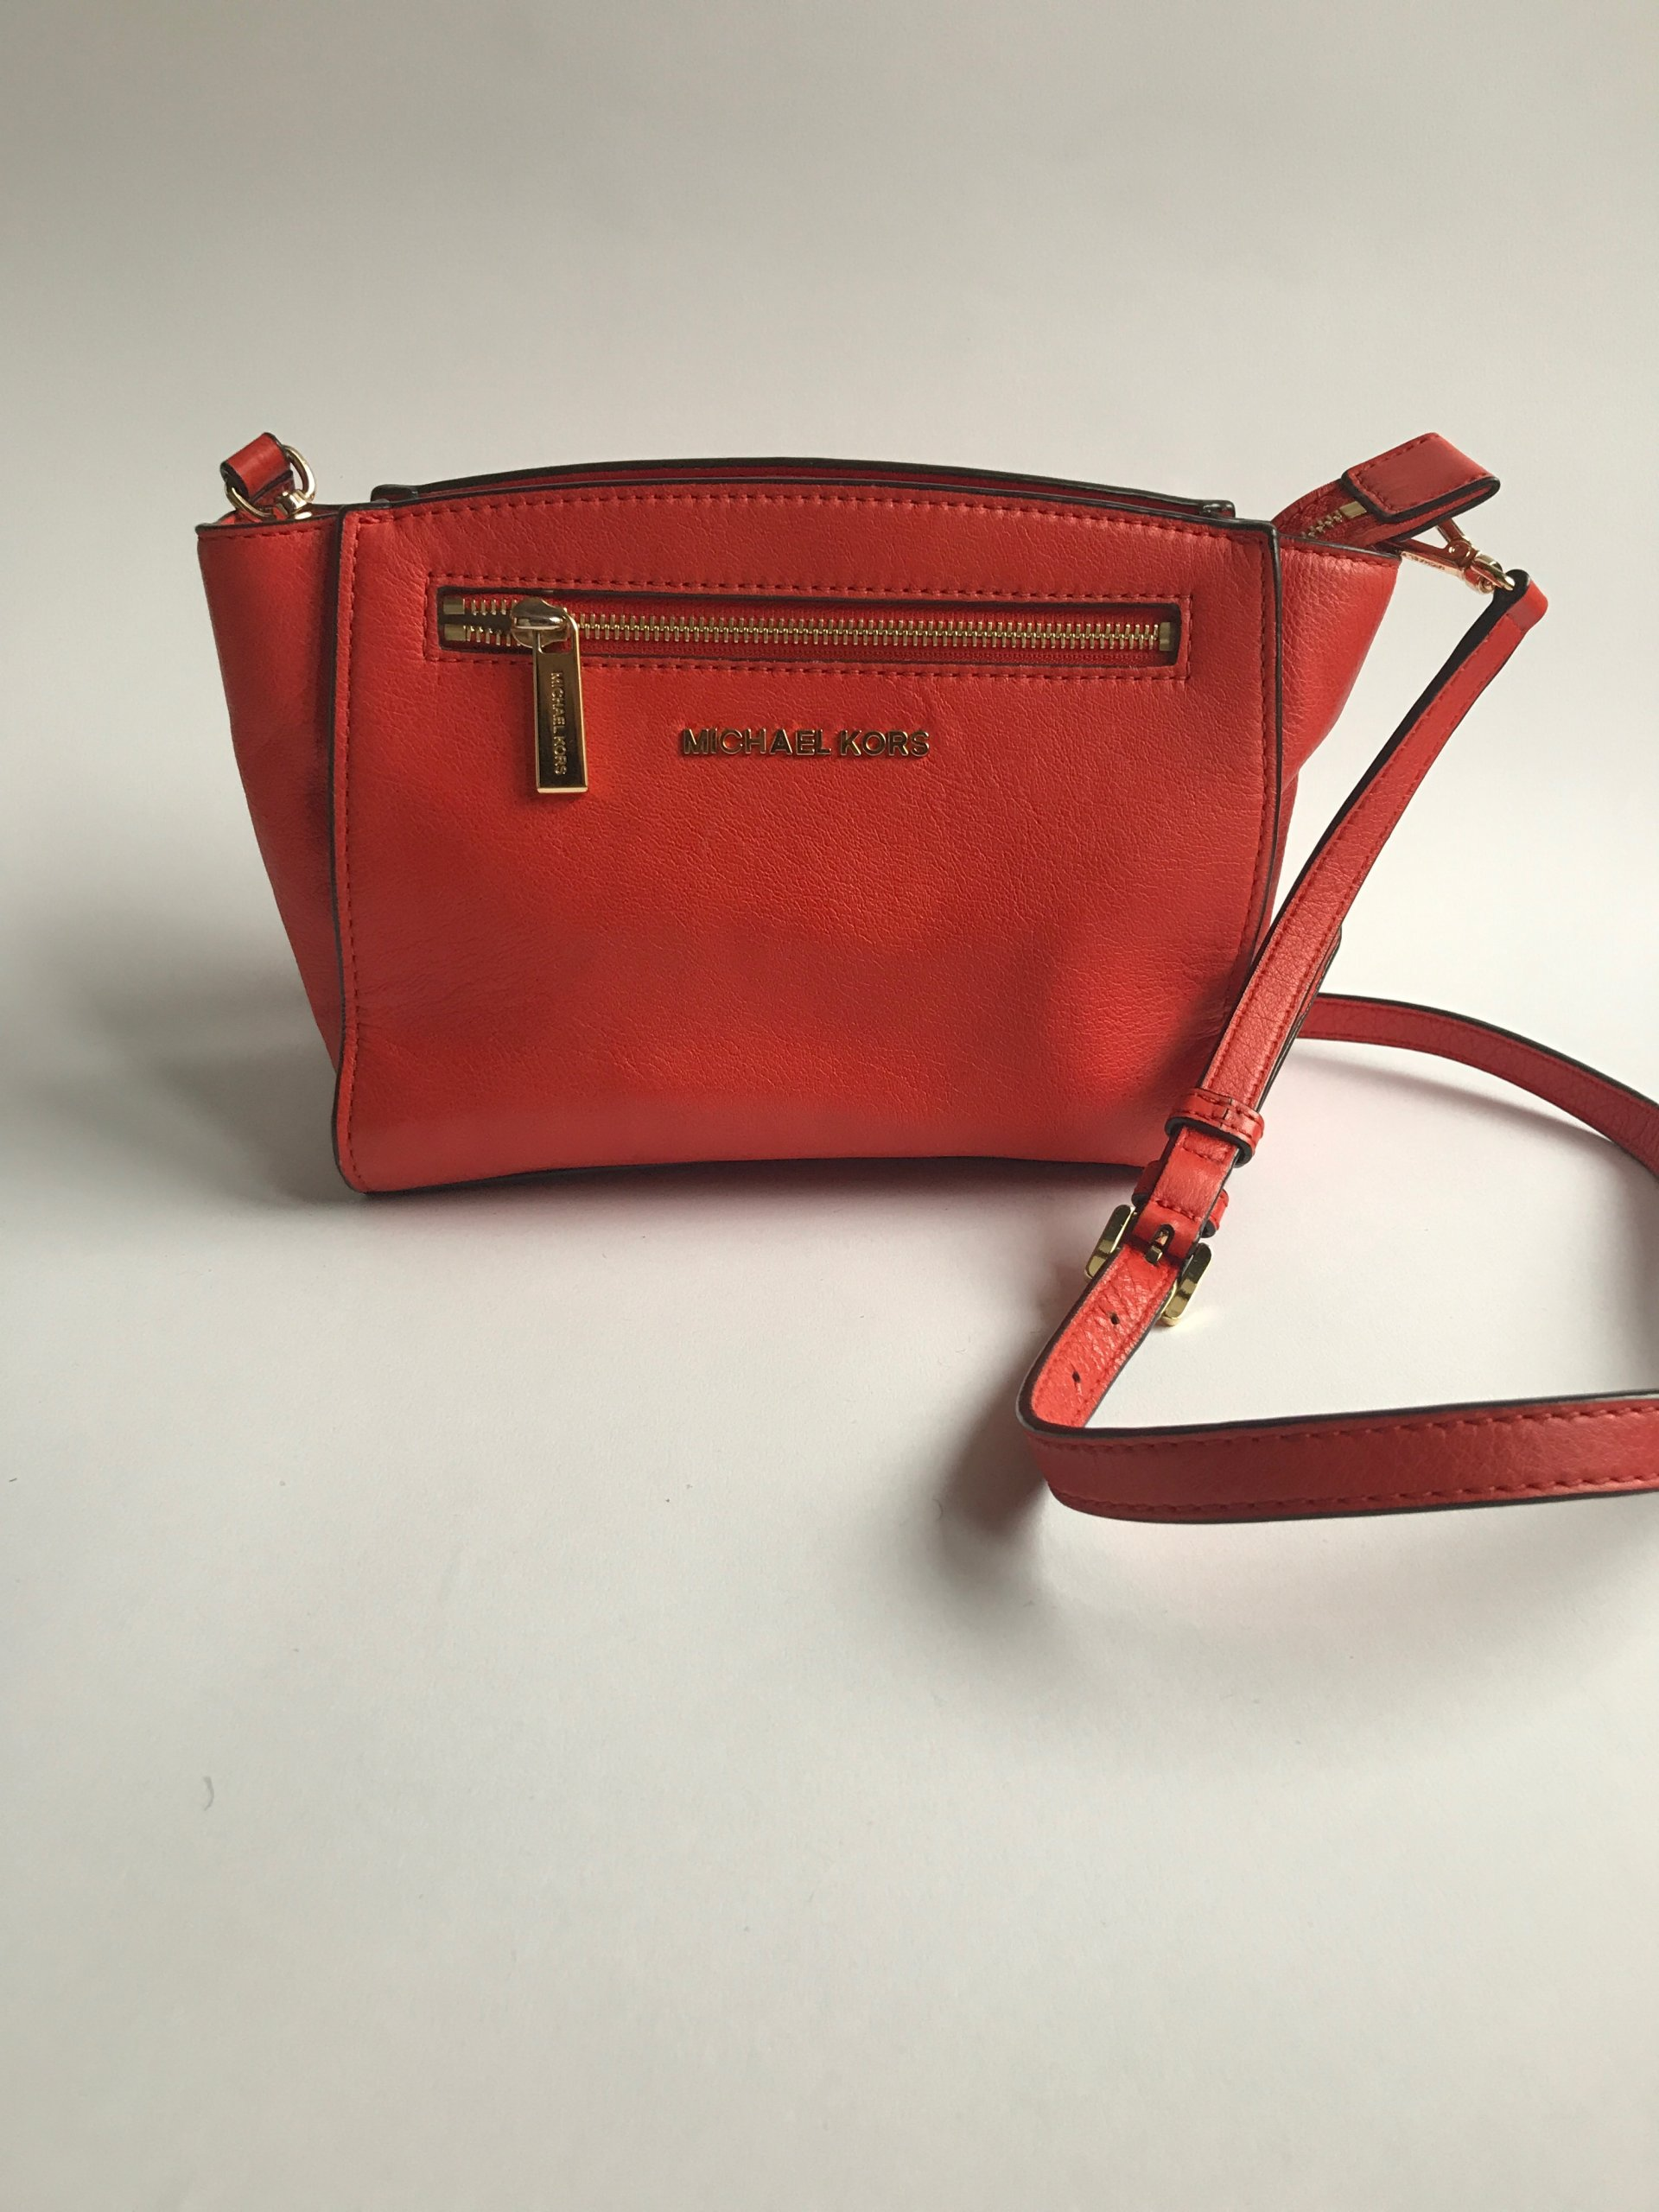 0baee0c1d9402 Oryginalna mała czerwona torebka Michael Kors - 7150173564 ...